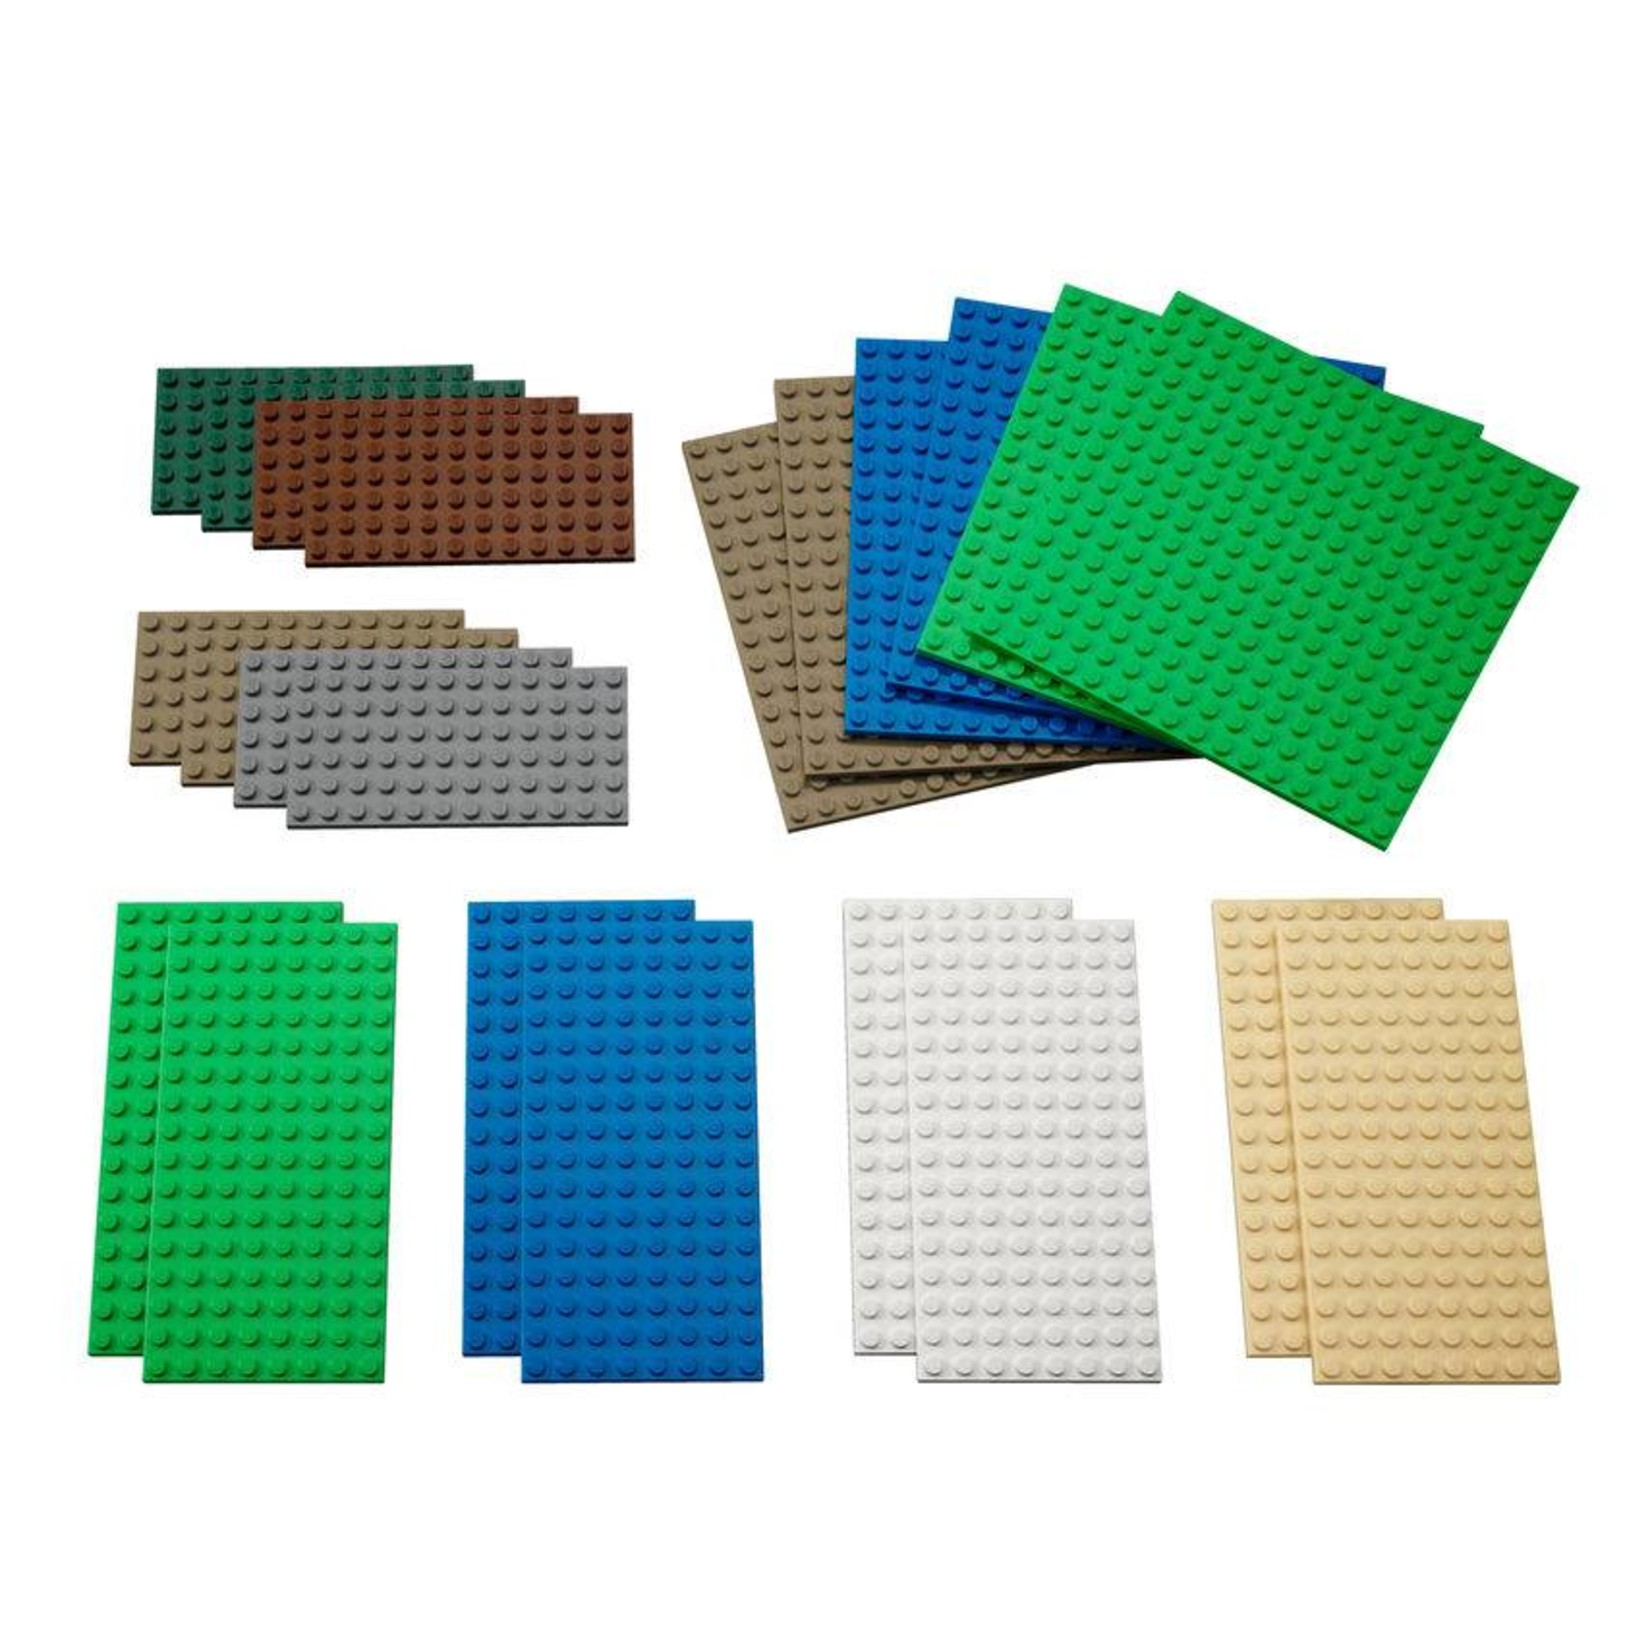 LEGO® Education  Kleine LEGO®  Bouwplaten